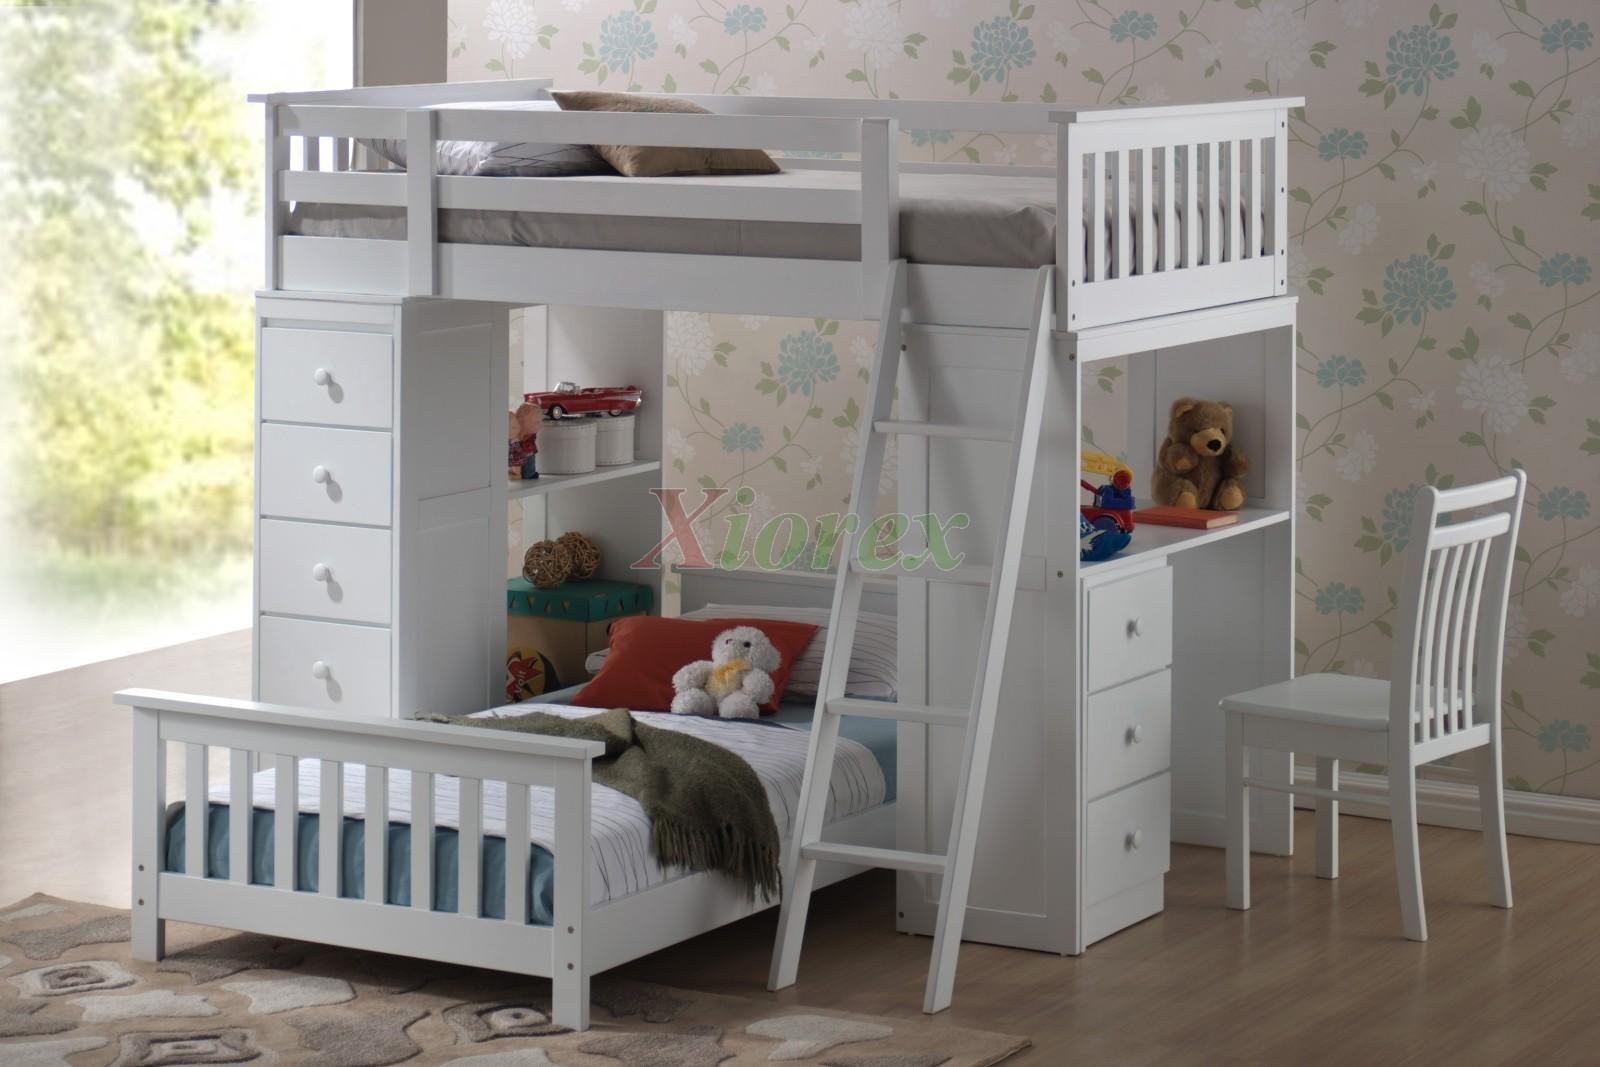 loft bunk beds for kids with storage desk xiorex huckleberry loft title=